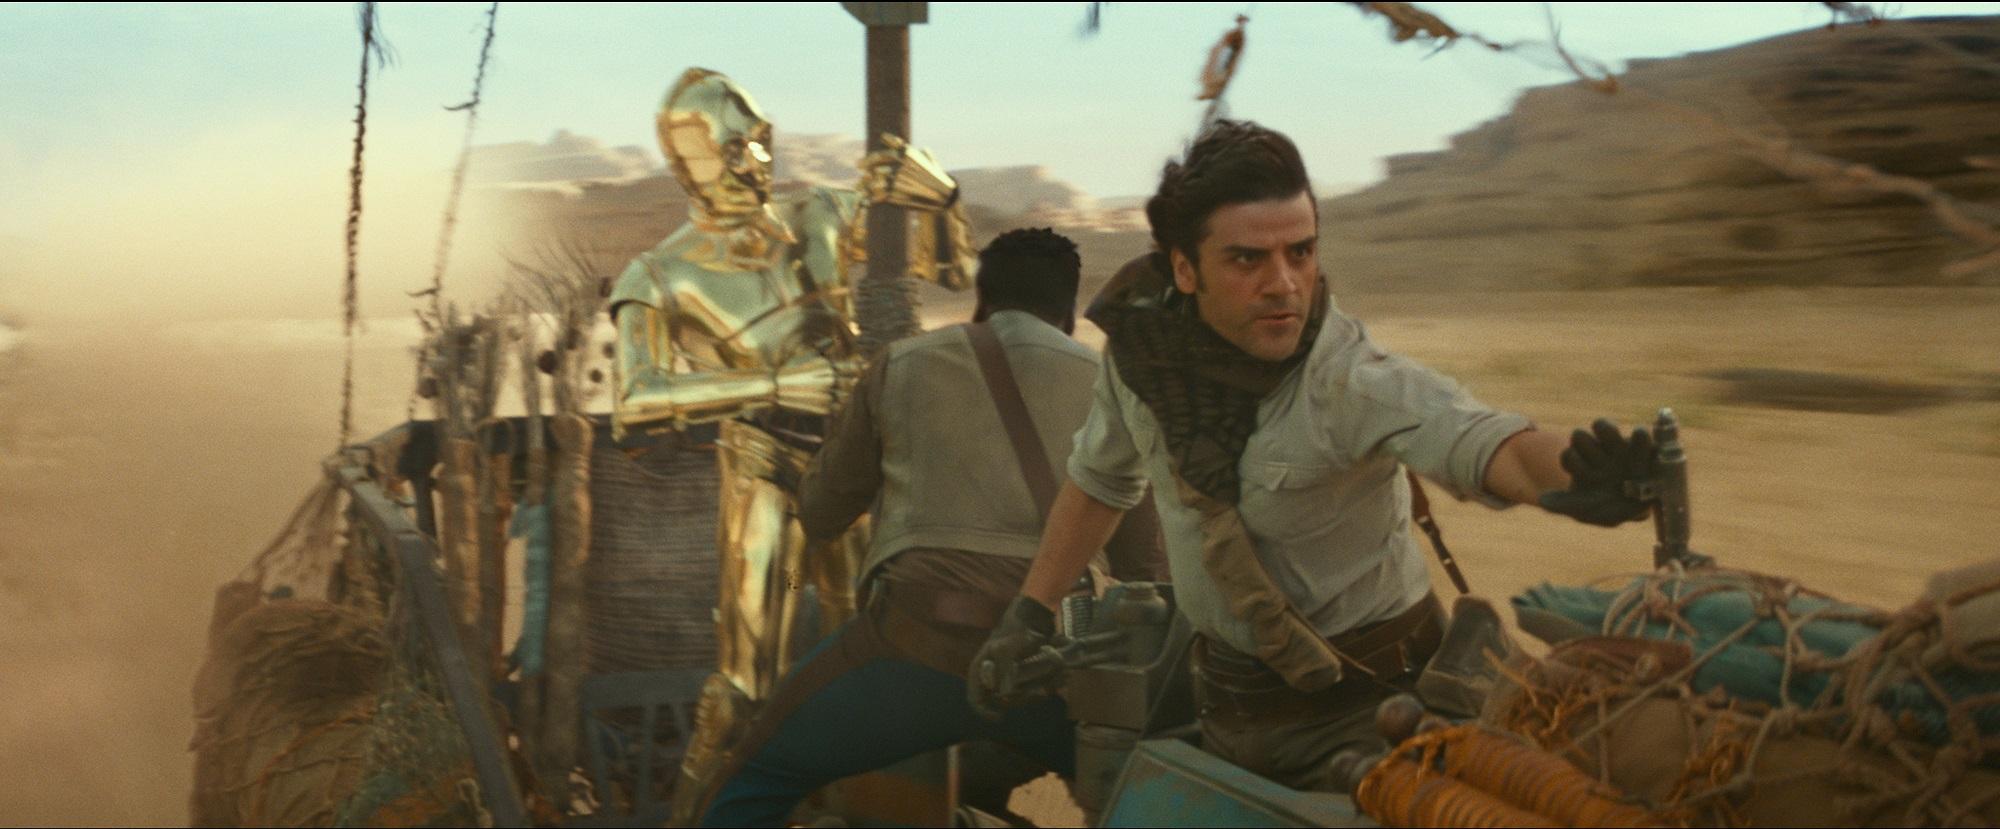 Star Wars (12).jpg